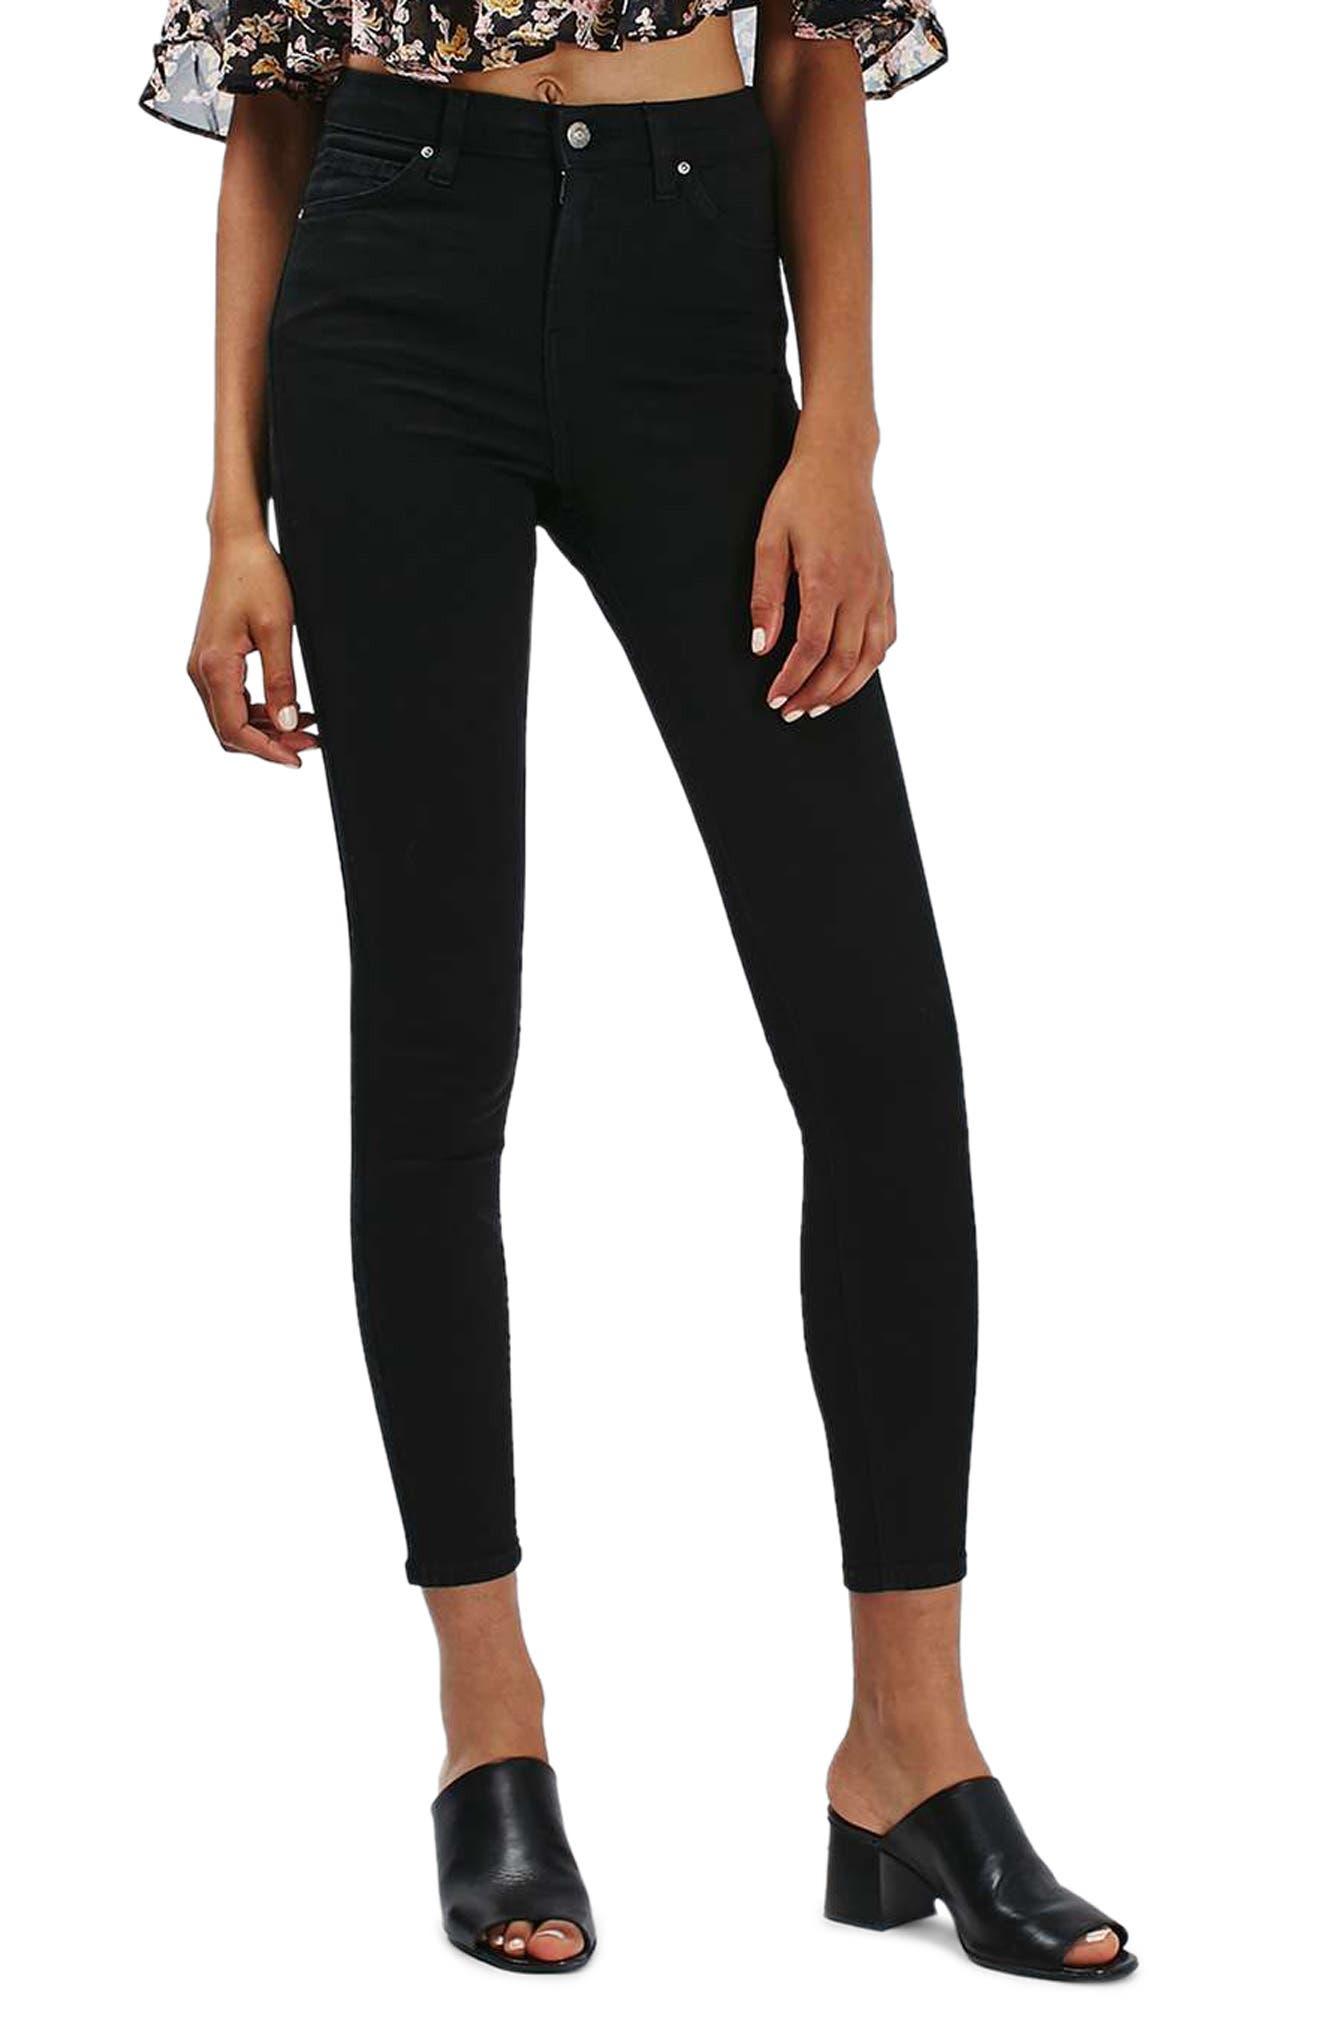 Main Image - Topshop Jamie High Waist Ankle Grazer Skinny Jeans